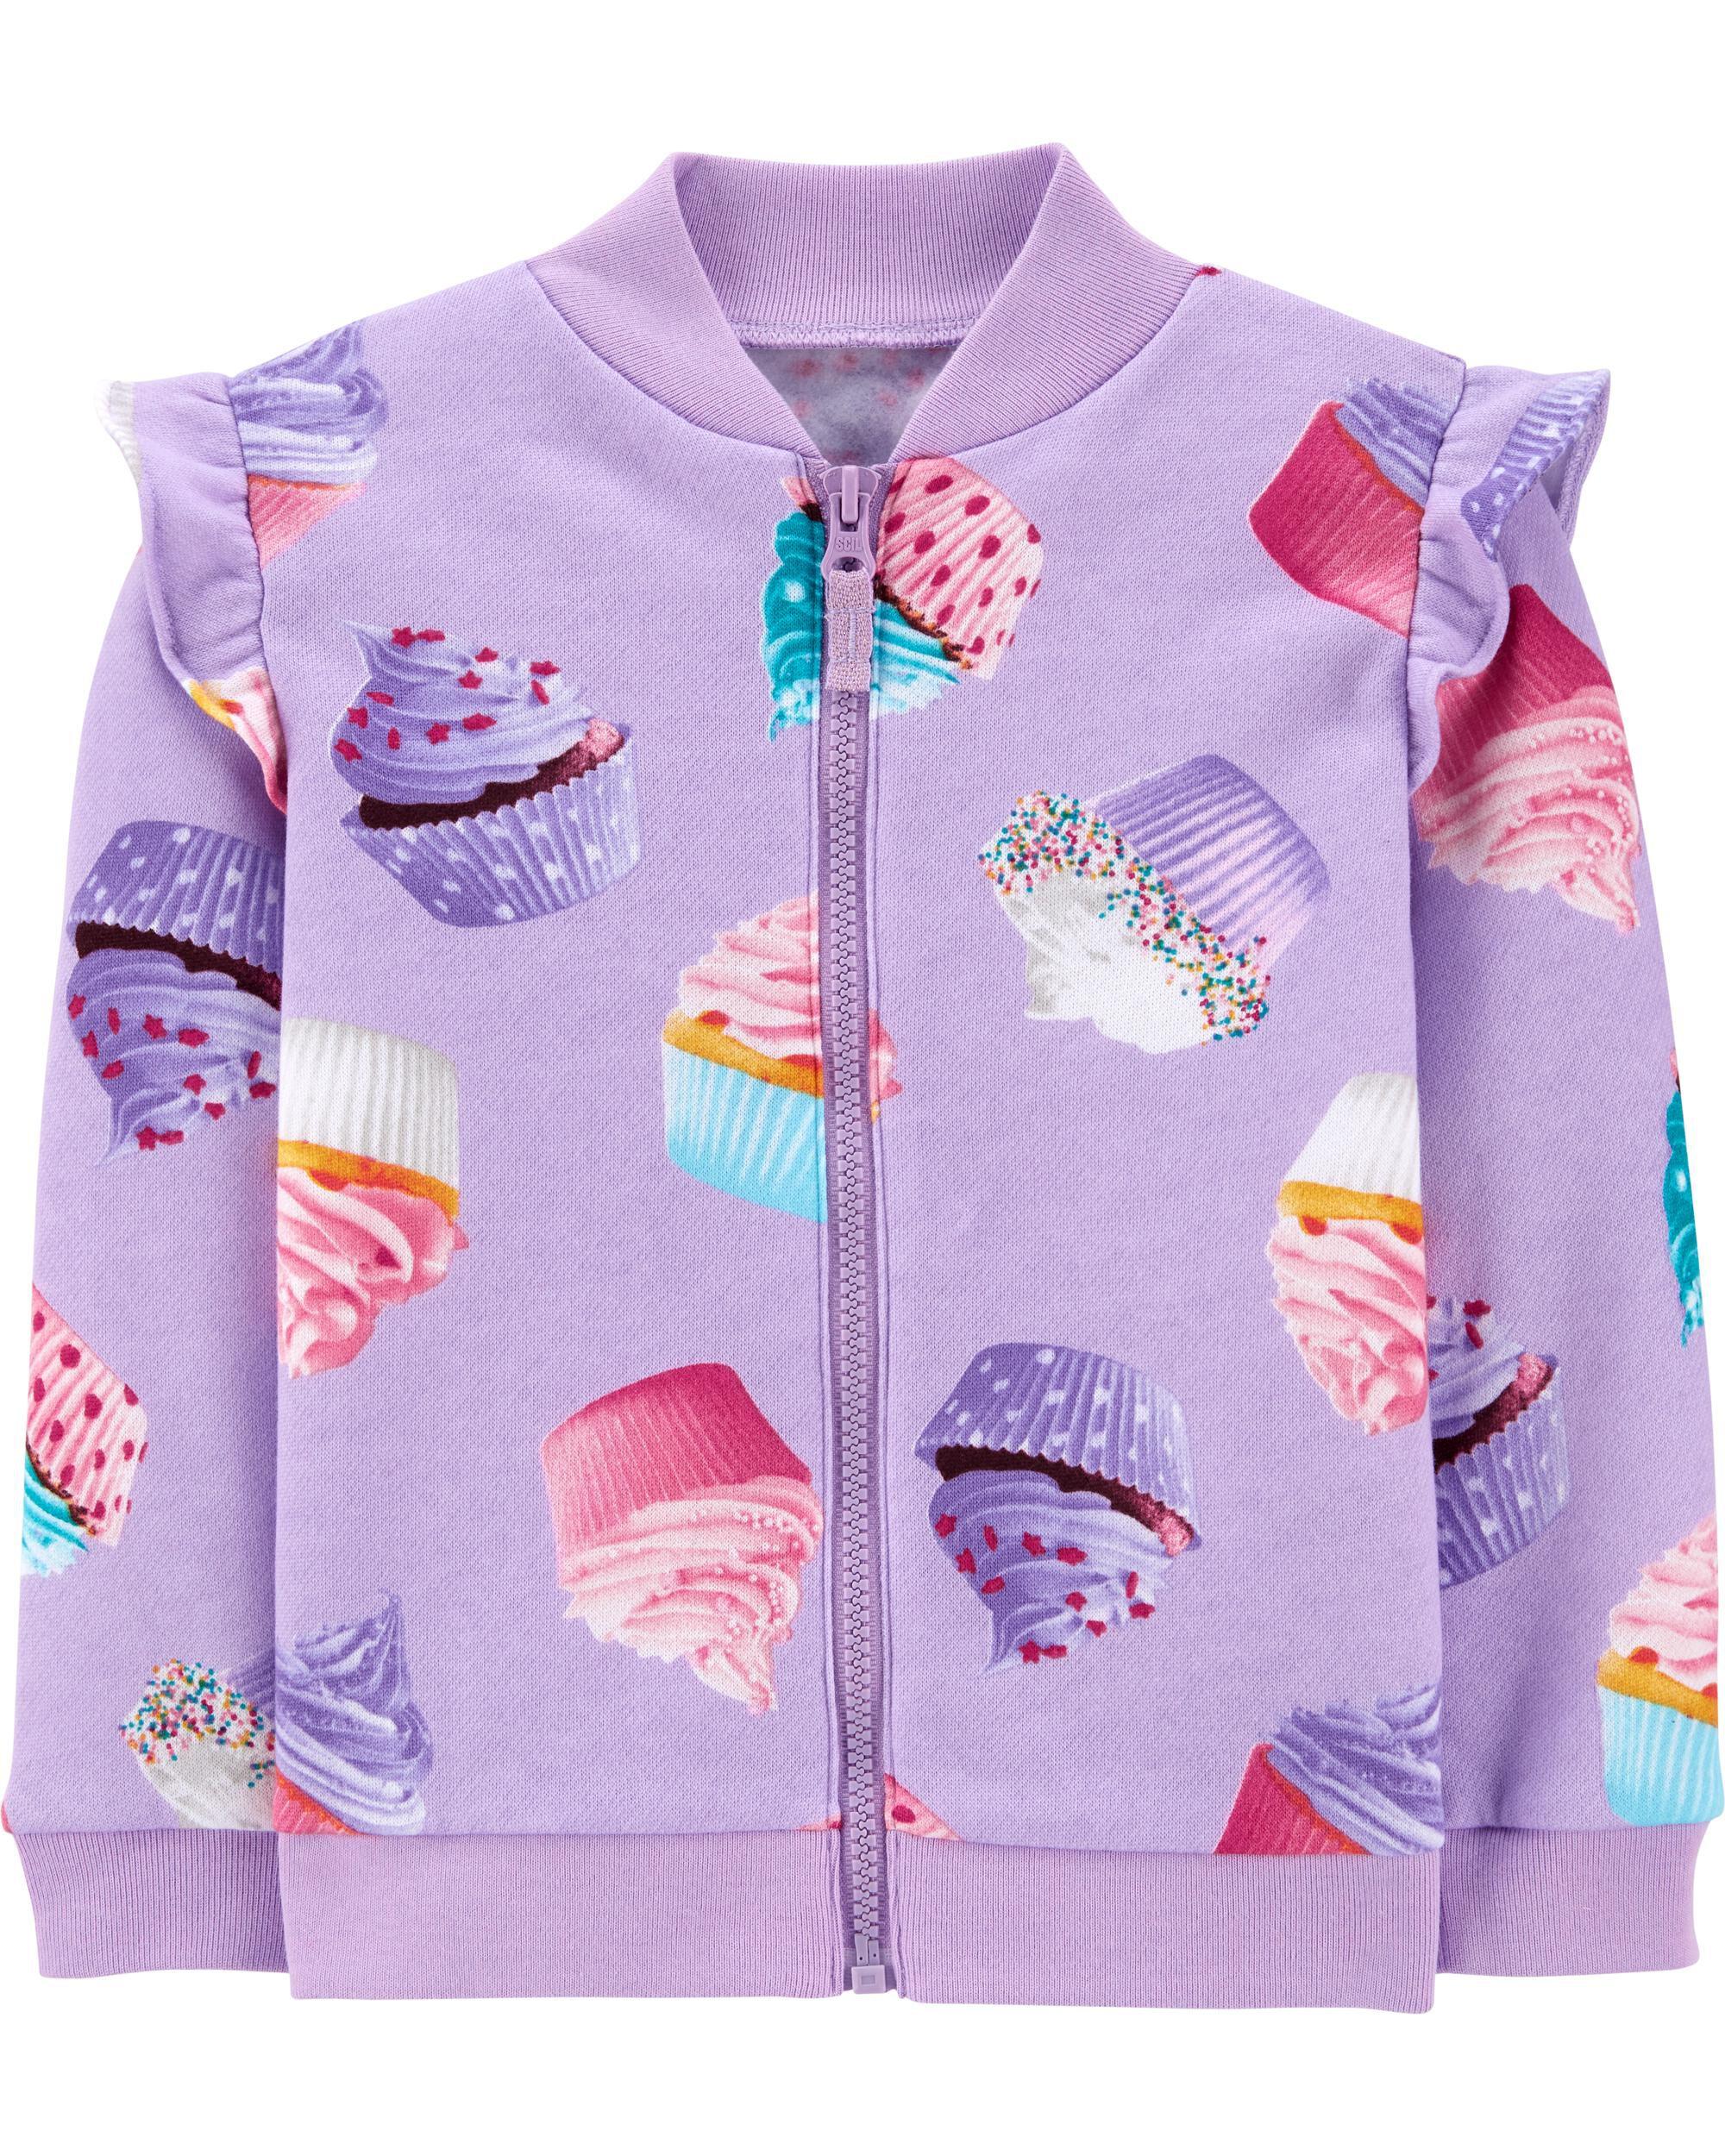 *CLEARANCE*Cupcake Zip-Up Fleece Jacket